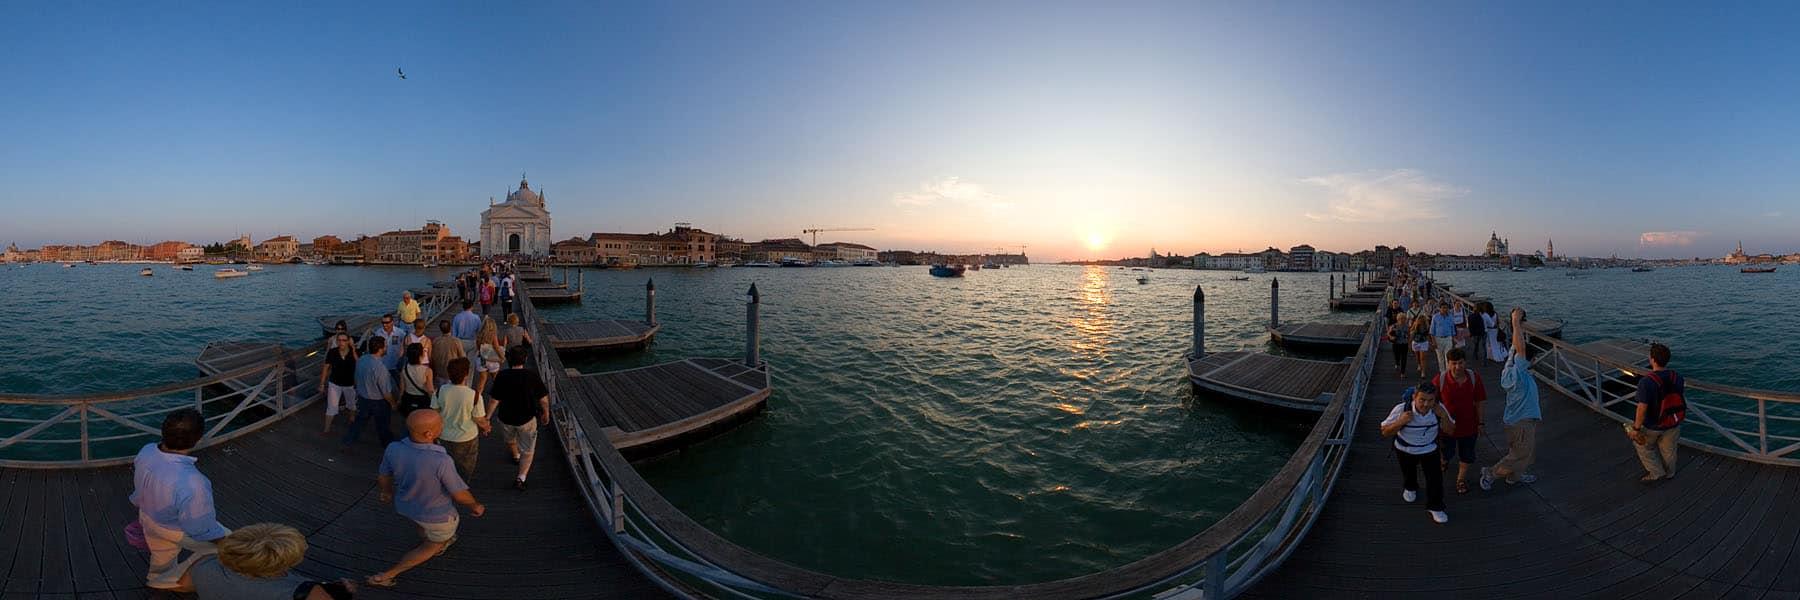 Feast Redentore Venezia